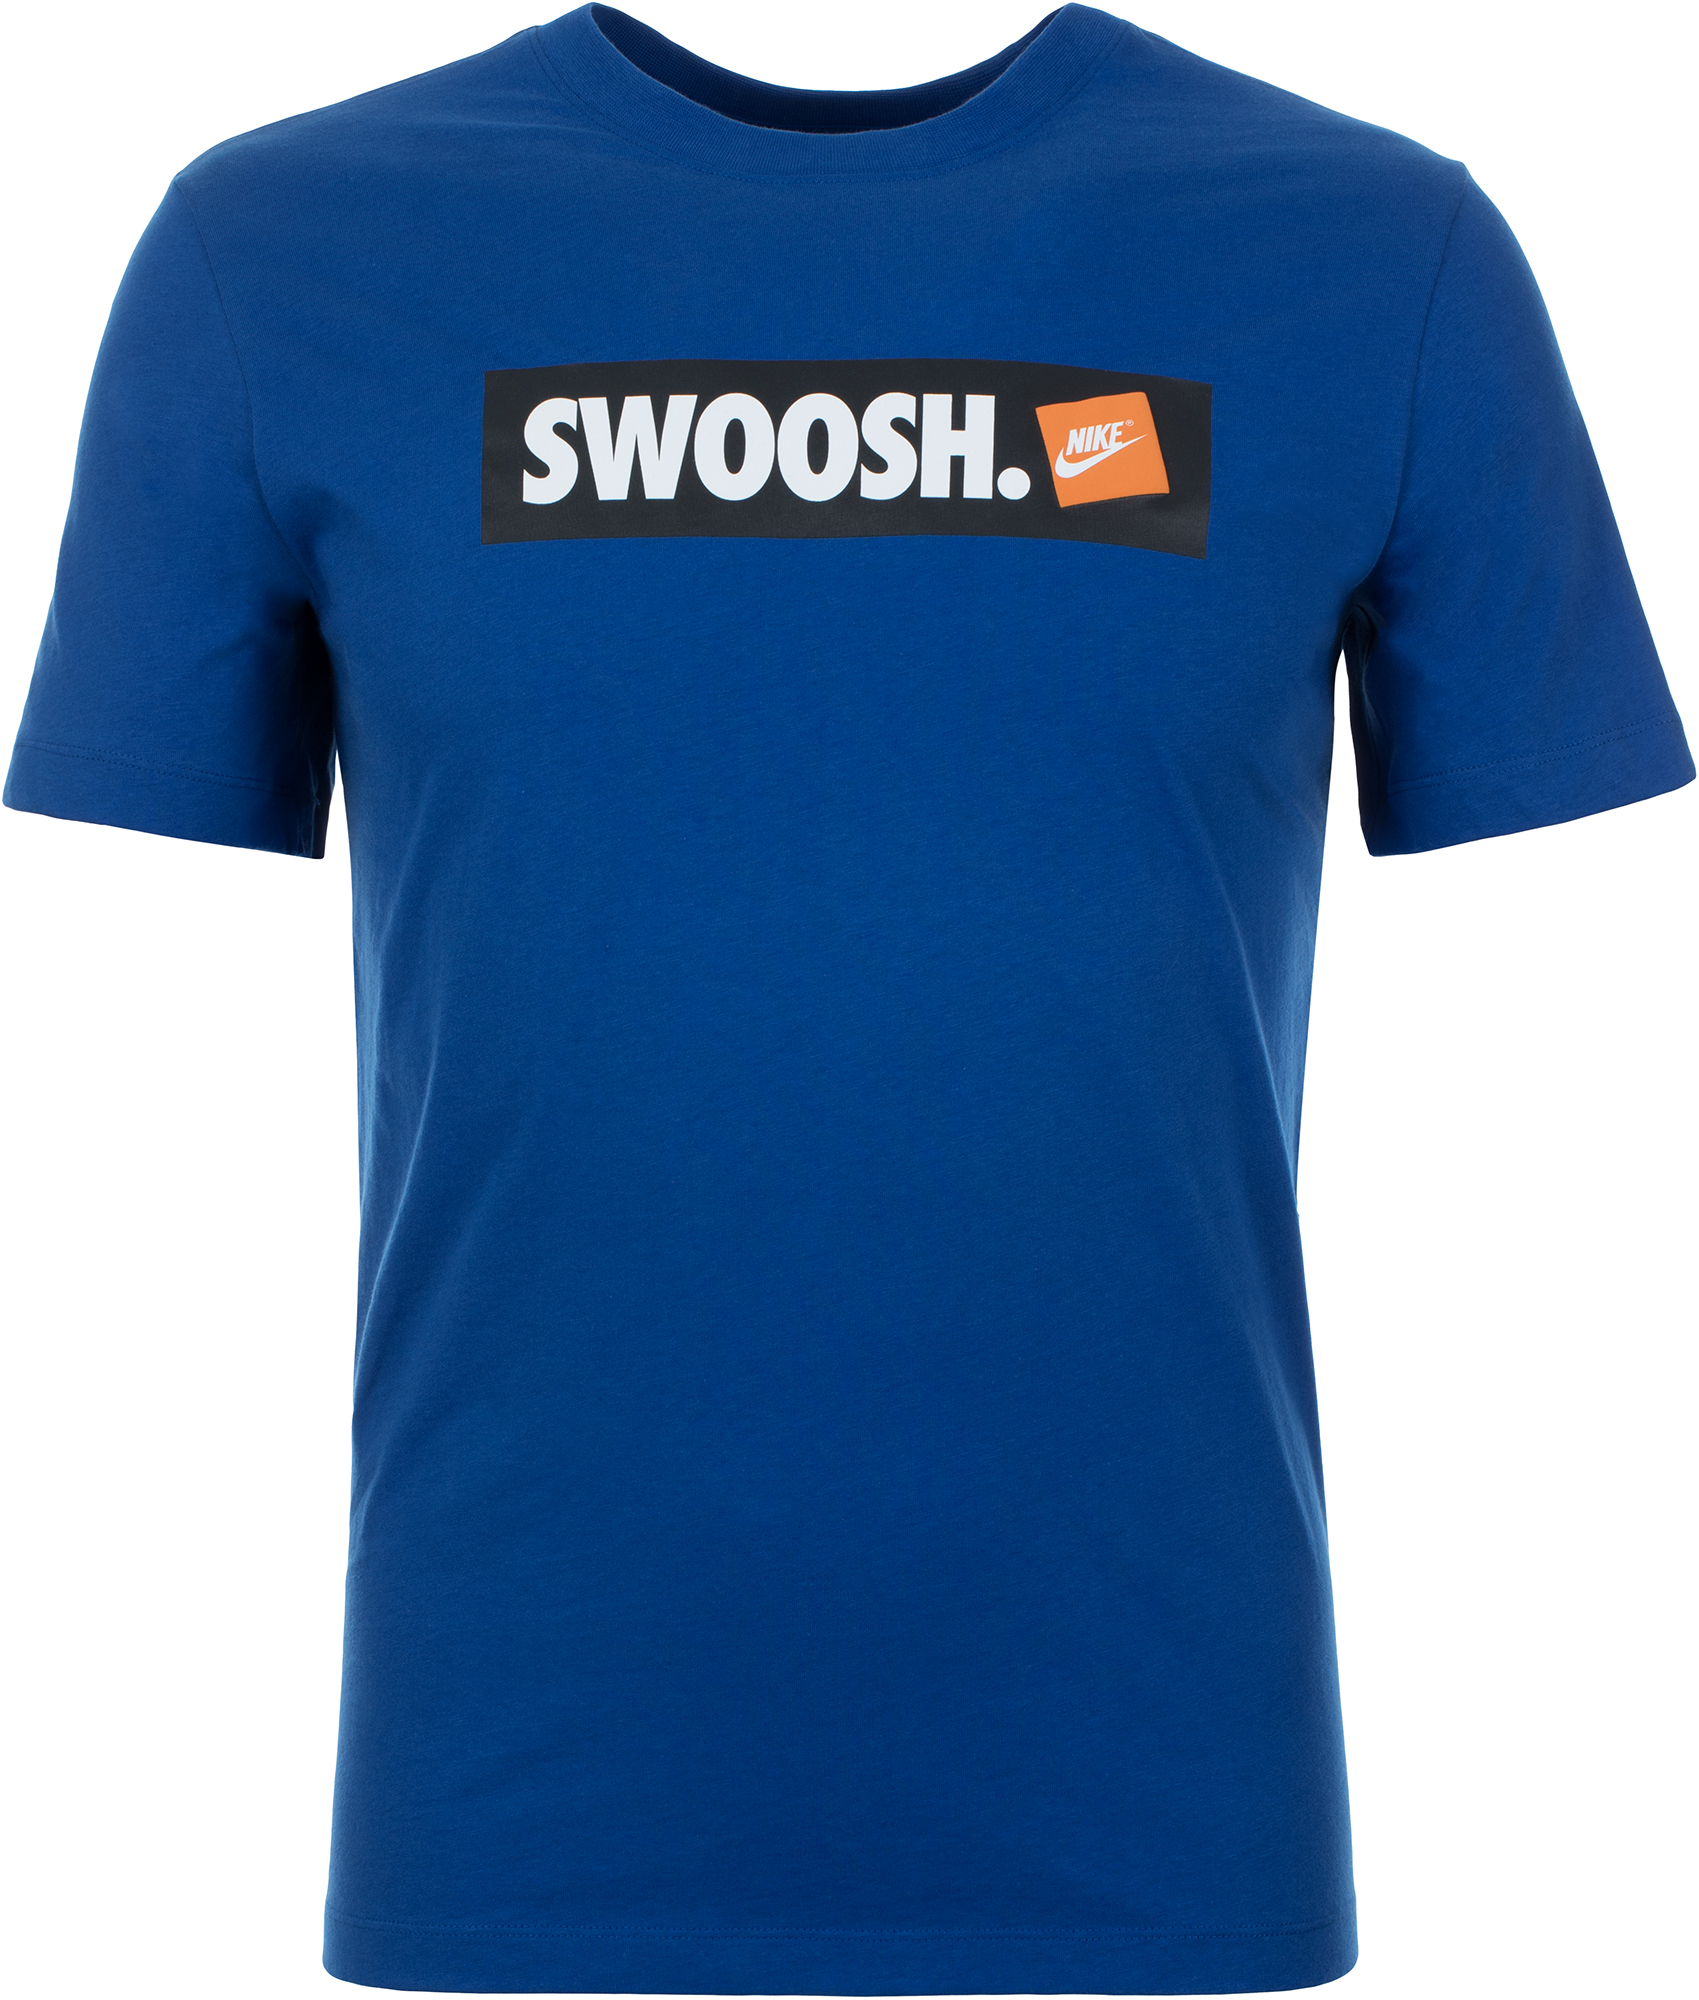 Фото Nike Футболка мужская Nike Sportswear Swoosh, размер 52-54